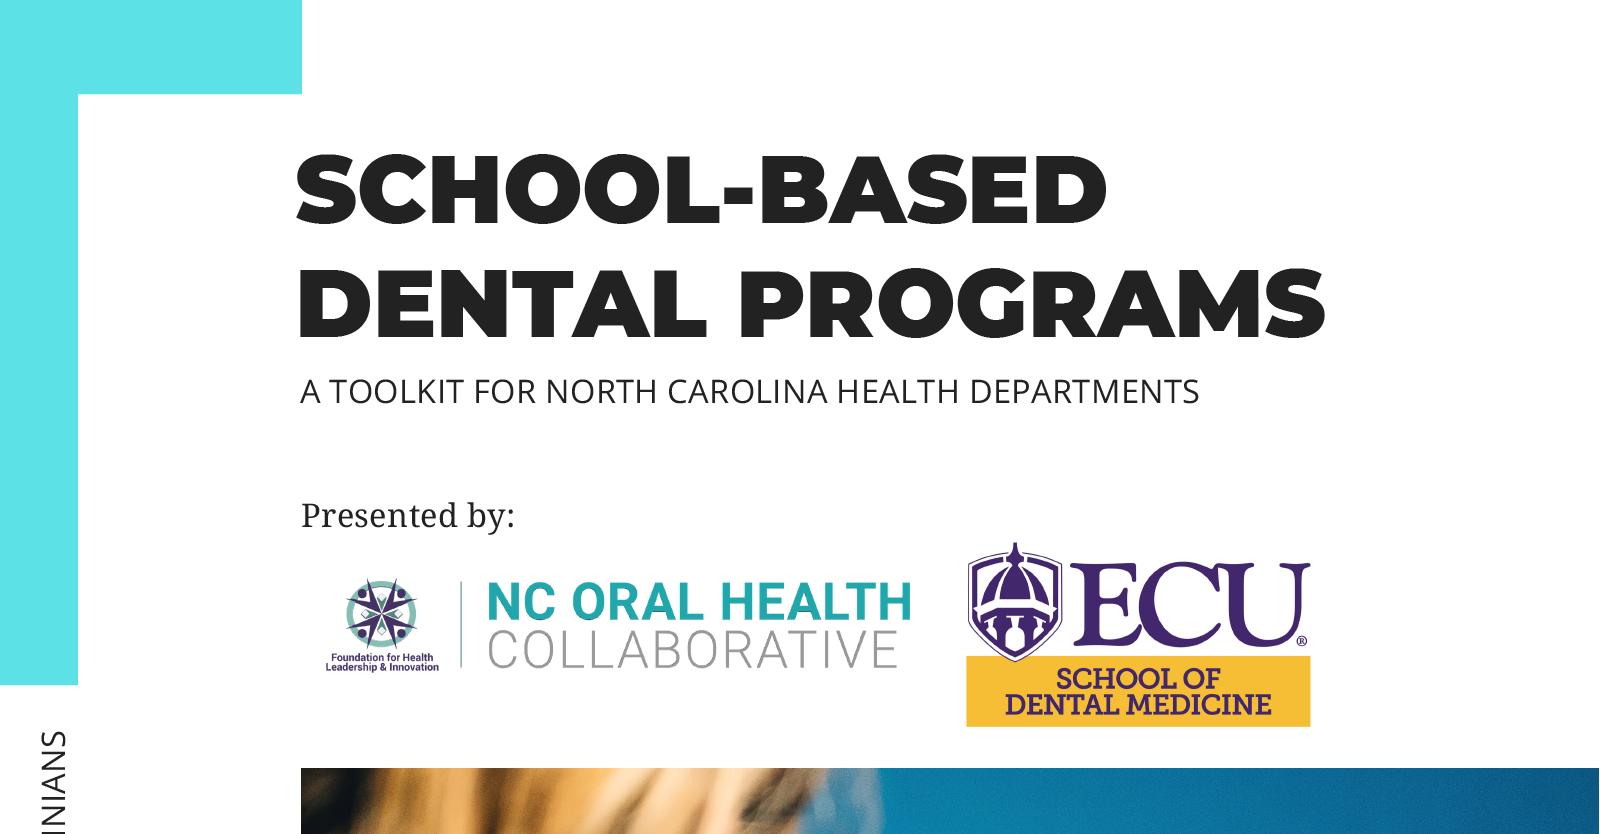 School-Based Dental Programs Toolkit